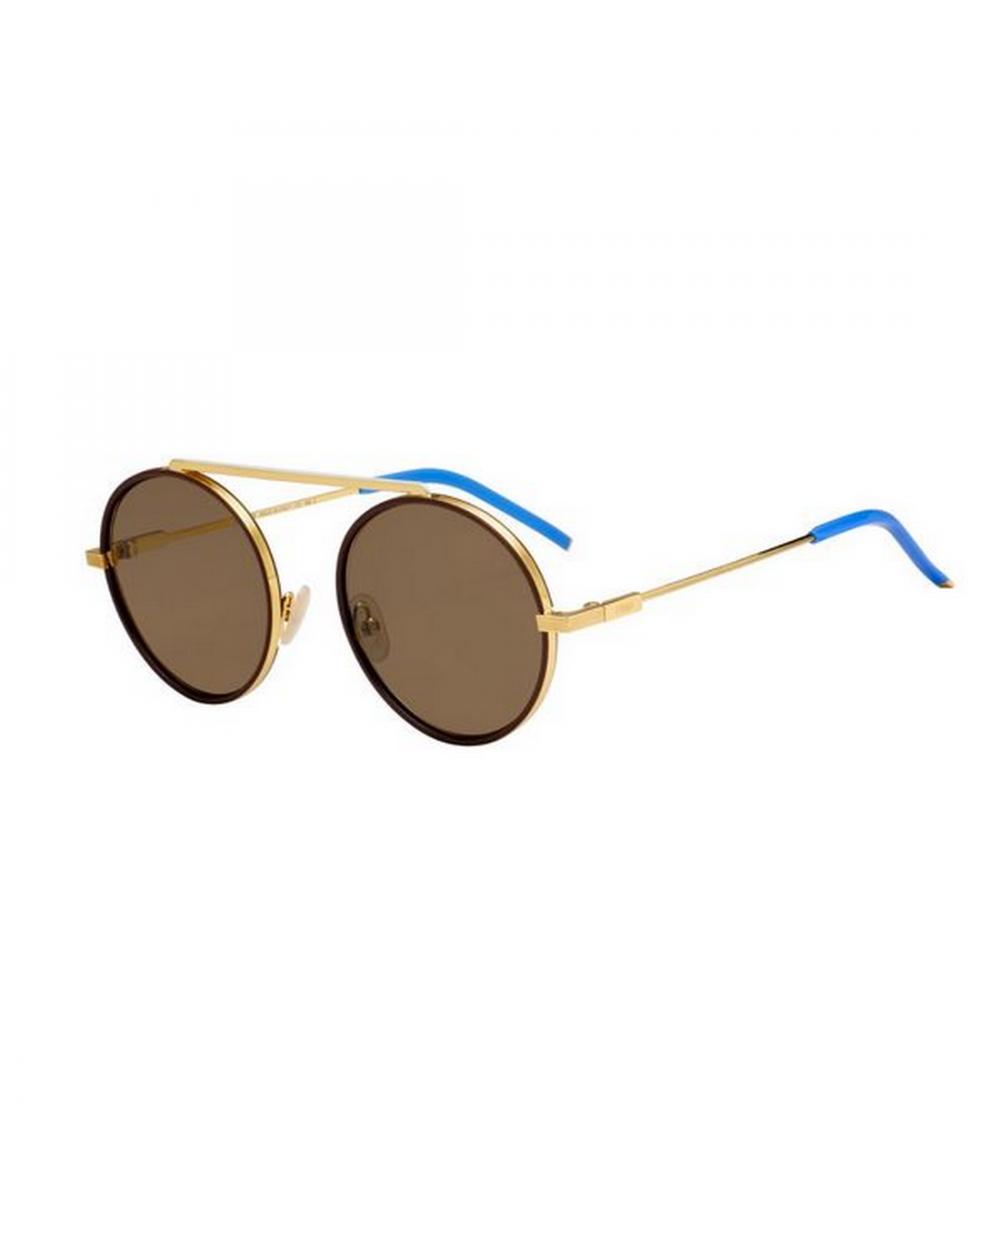 Sunglasses Fendi FF M0025/S original package warranty Italy